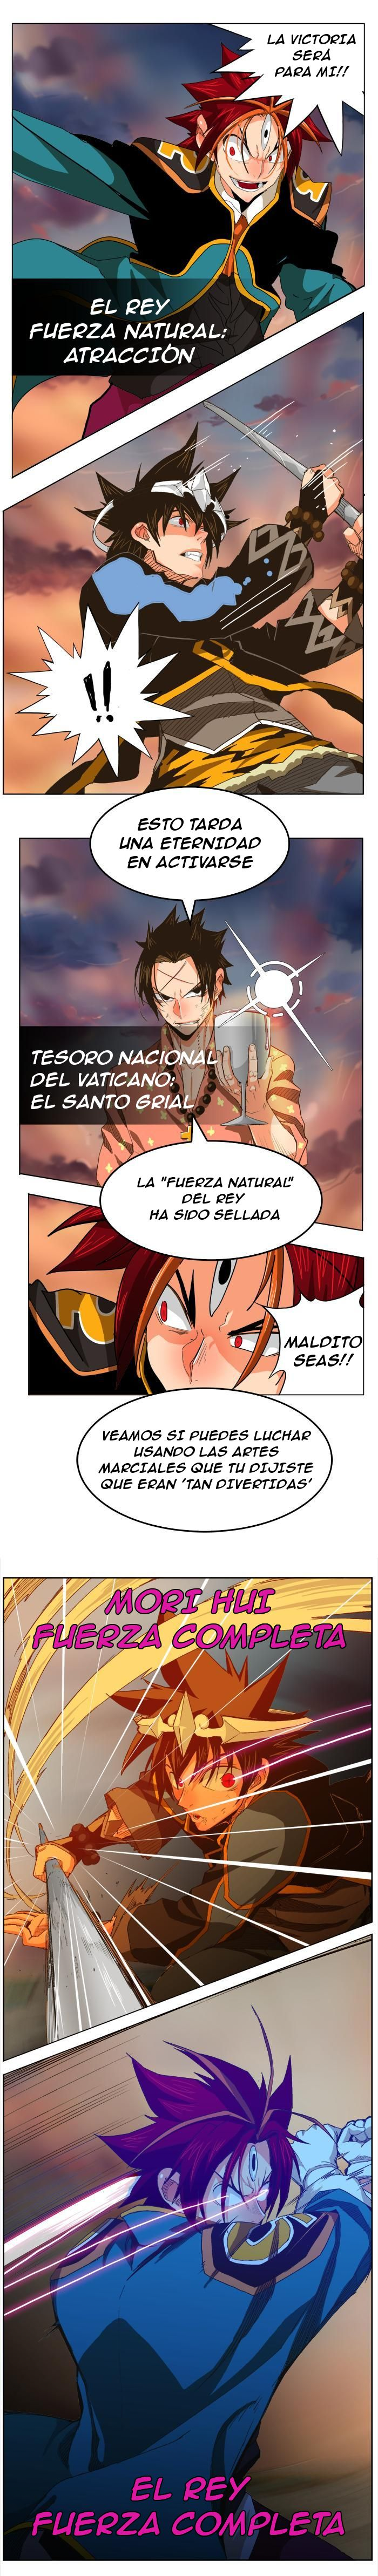 http://c5.ninemanga.com/es_manga/37/485/484868/37eaaed2a19e86c474d9c37150d60308.jpg Page 5